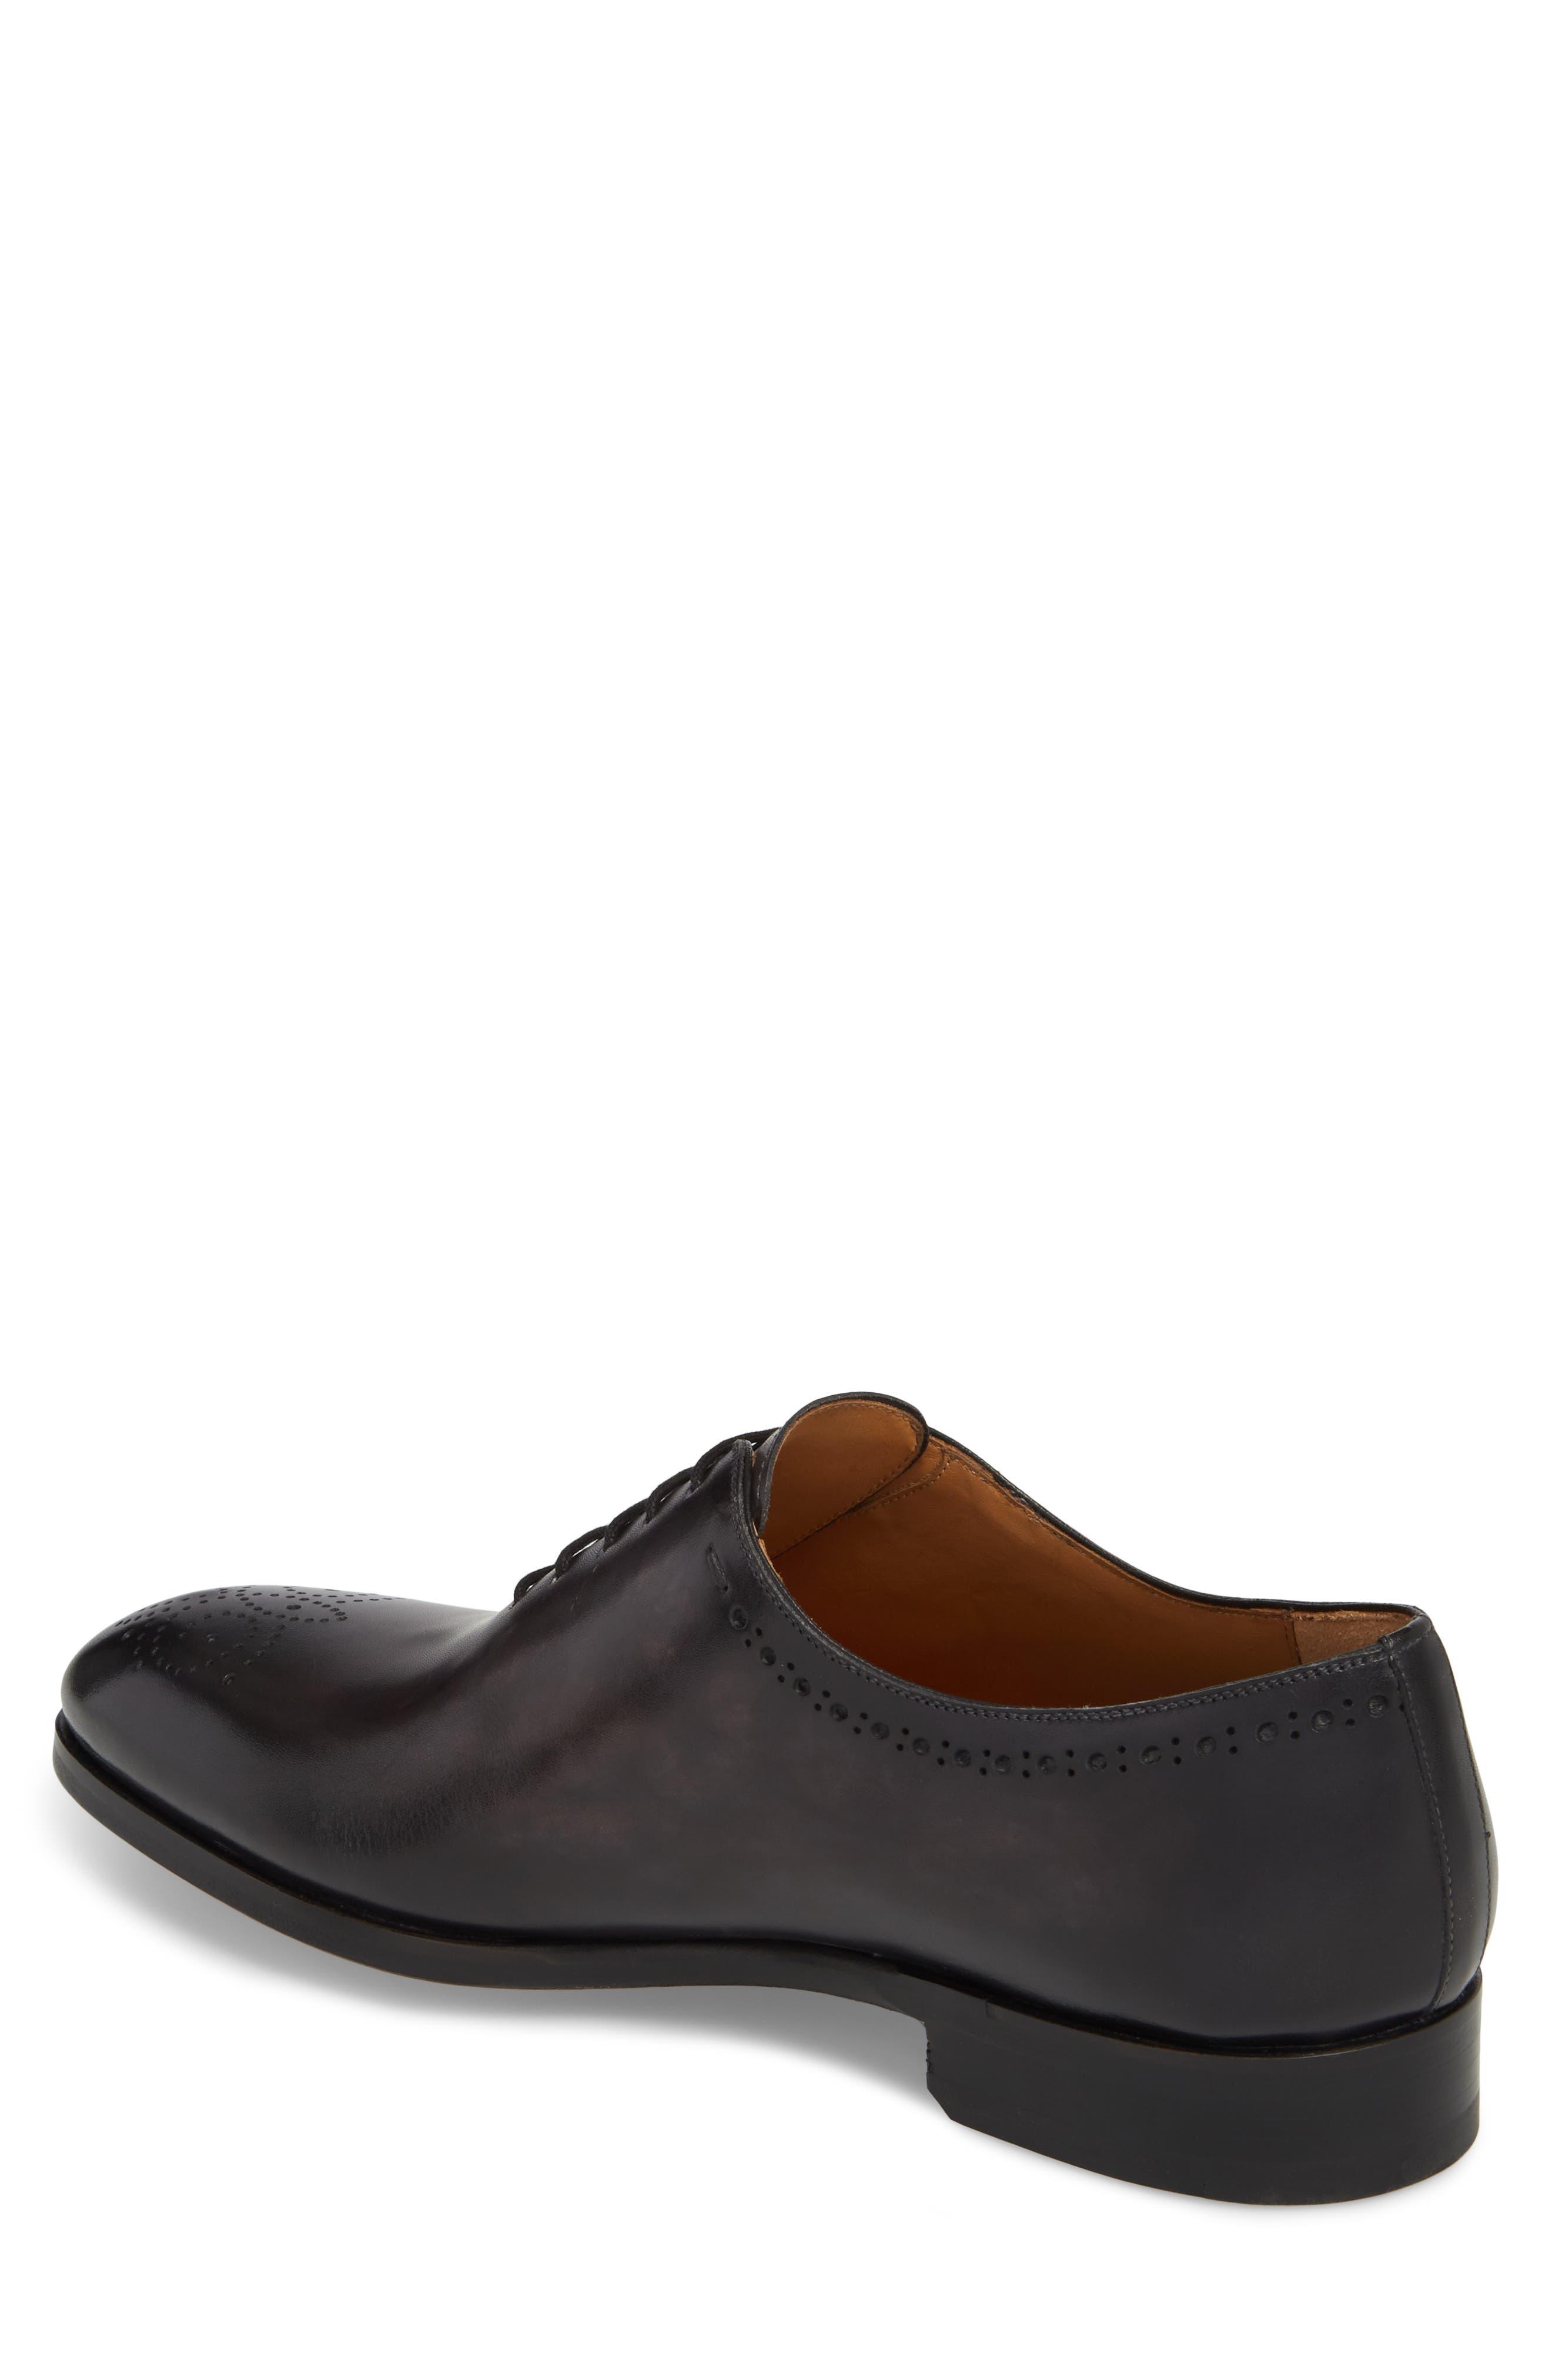 Paolo Brogued Whole Cut Shoe,                             Alternate thumbnail 2, color,                             020